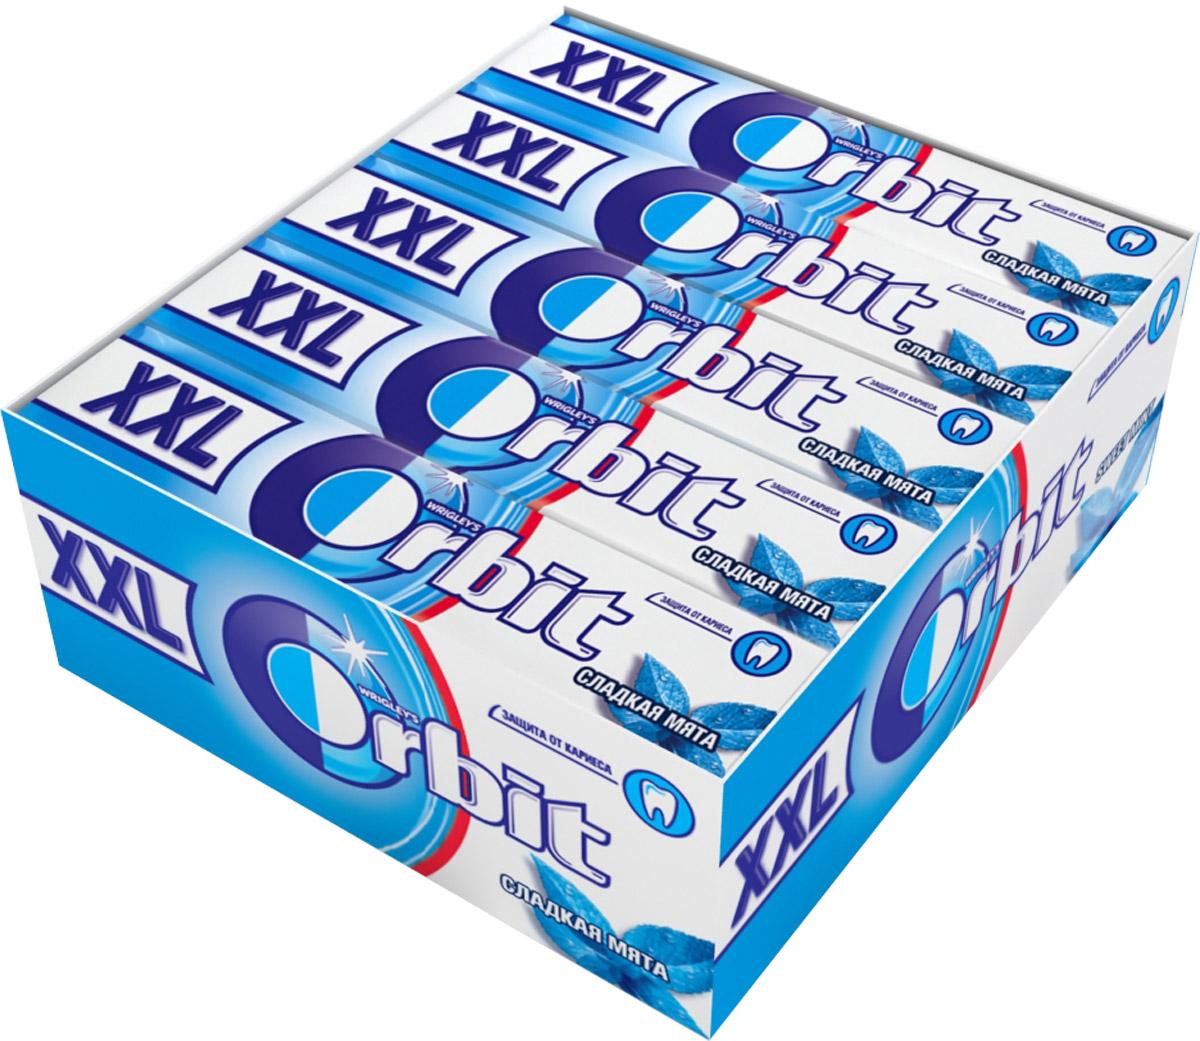 Orbit XXL Сладкая мята жевательная резинка без сахара, 20 пачек по 20,4 г orbit xxl white сочное яблоко жевательная резинка без сахара 20 пачек по 20 4 г